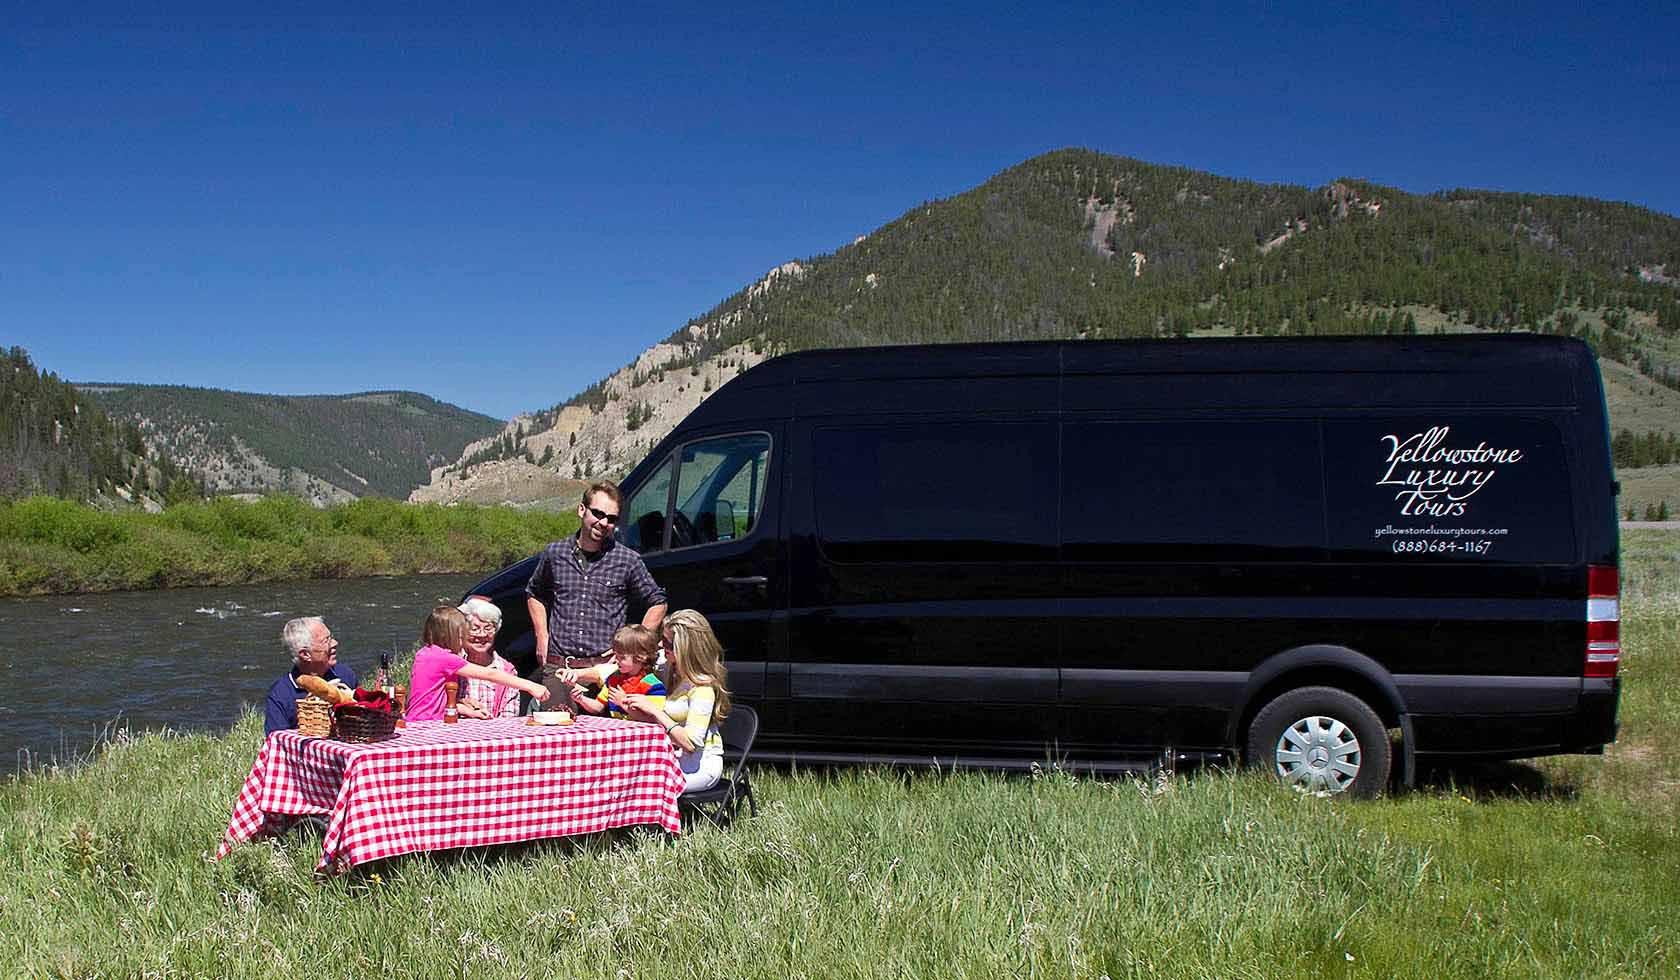 Yellowstone Luxury Tours profile image